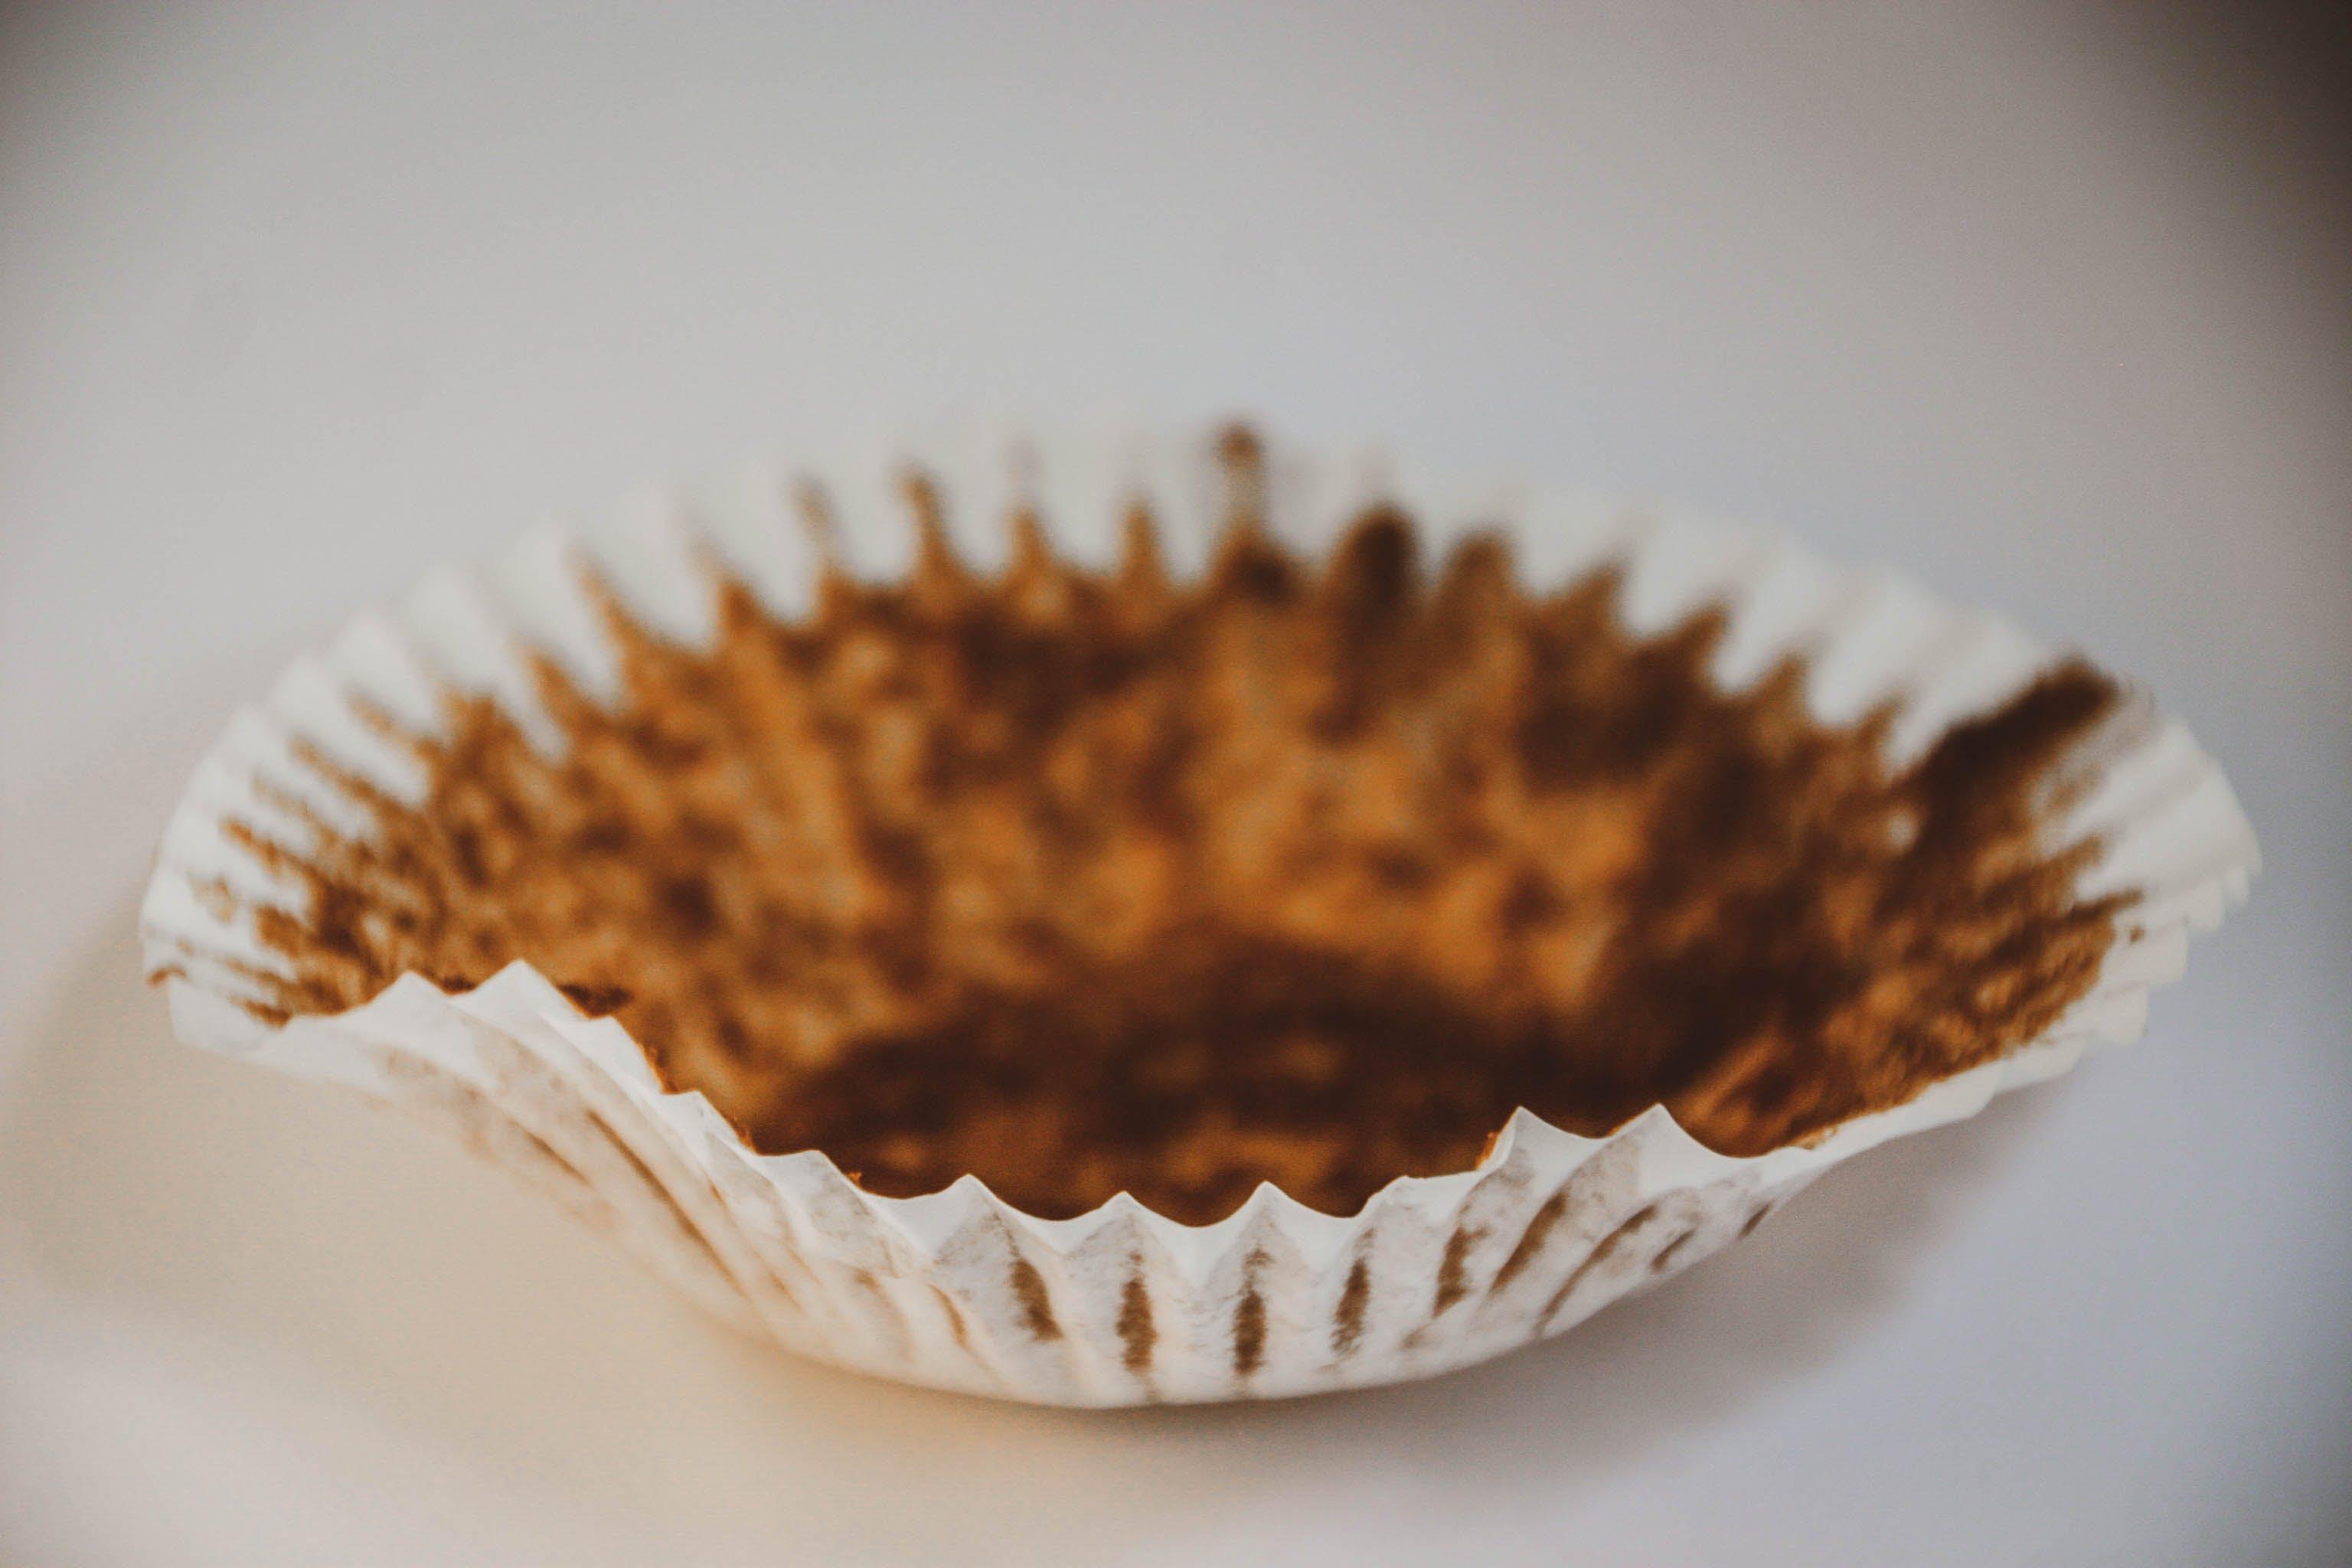 Free stock photo of chocolate cupcakes, crumpled paper, cupcake